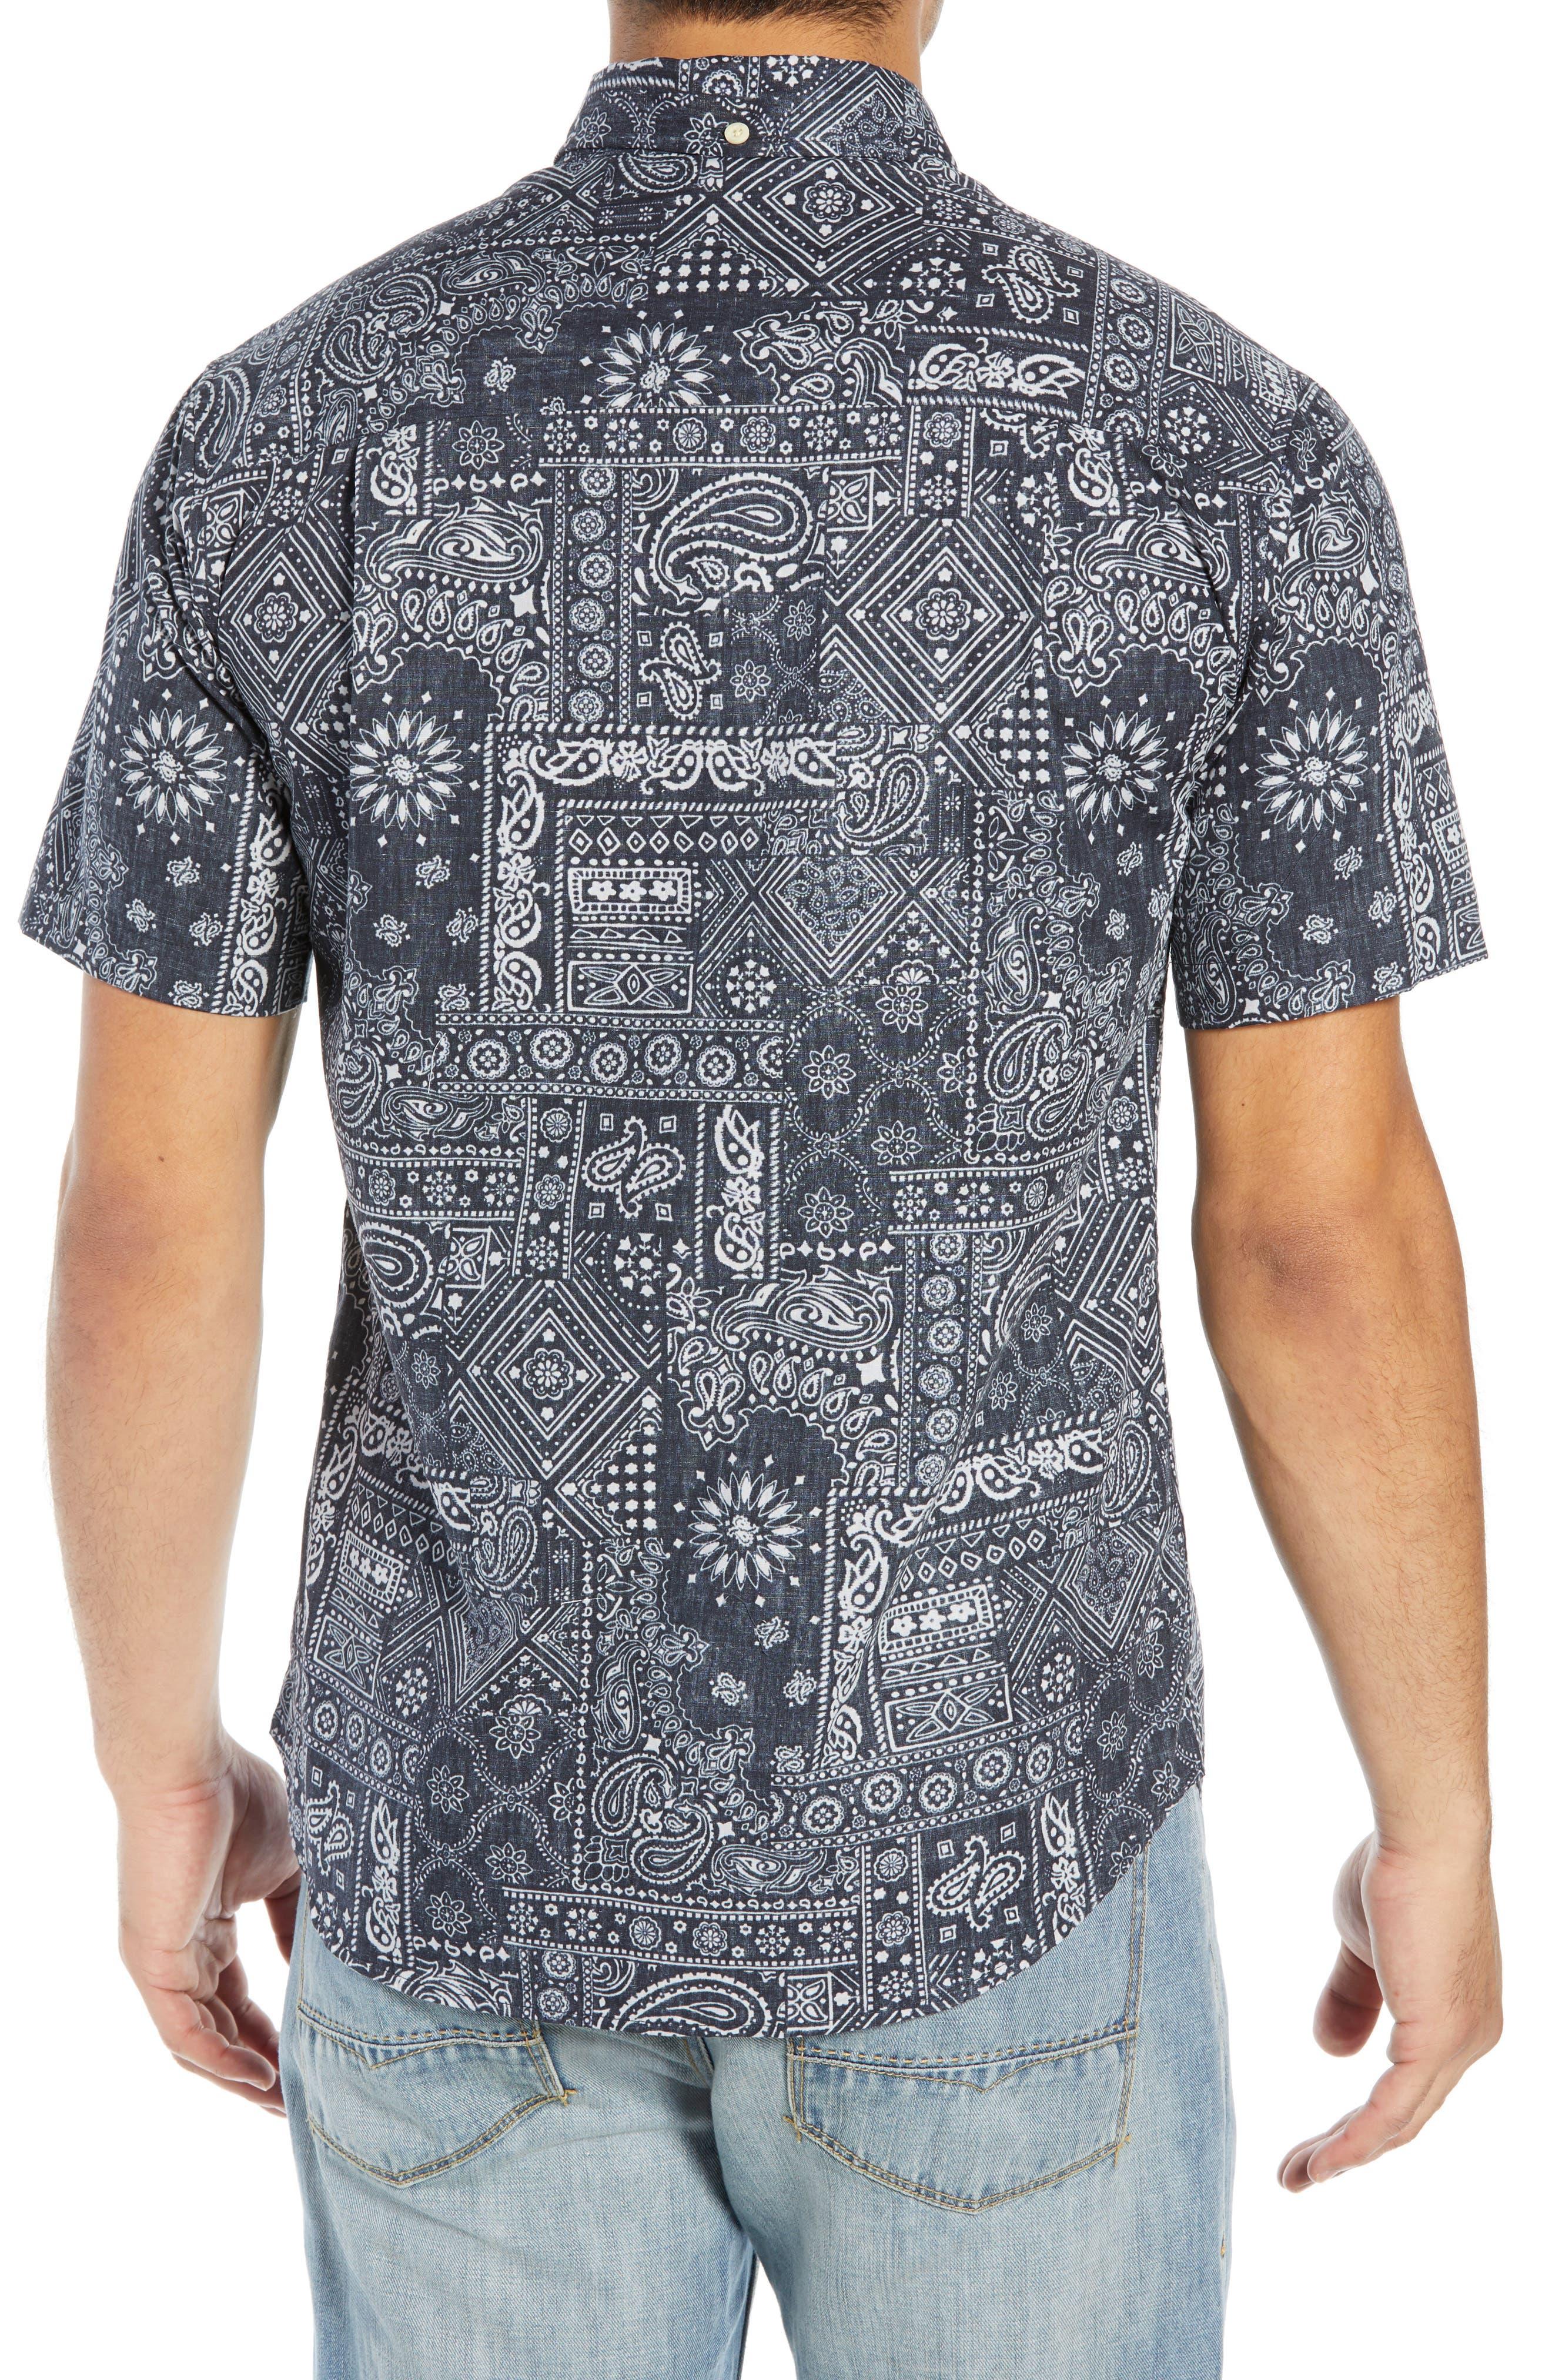 REYN SPOONER, Aloha Bandana Regular Fit Sport Shirt, Alternate thumbnail 3, color, 001